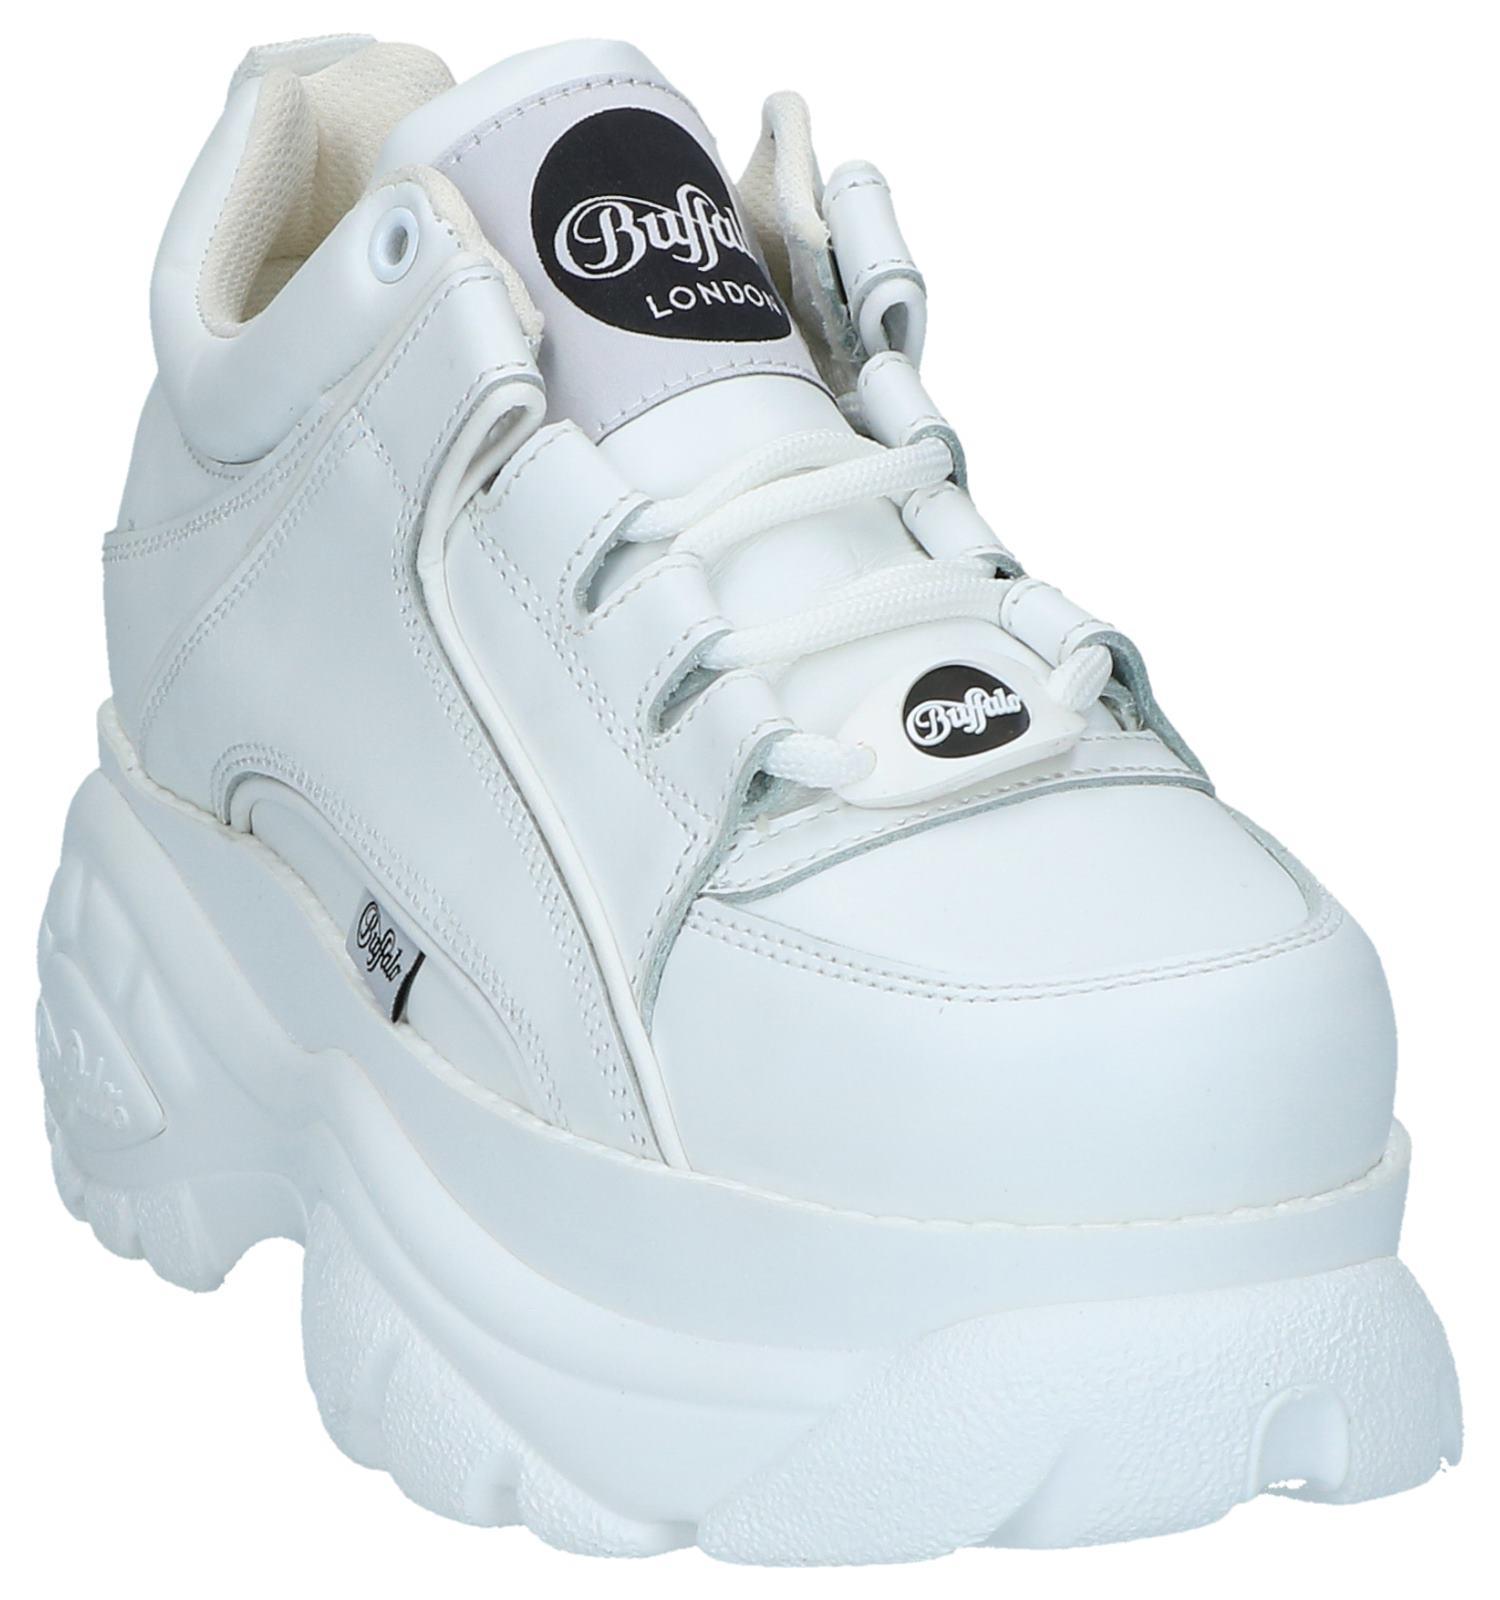 c28f2c72aac Witte Sneakers Buffalo London Classic Low | TORFS.BE | Gratis verzend en  retour